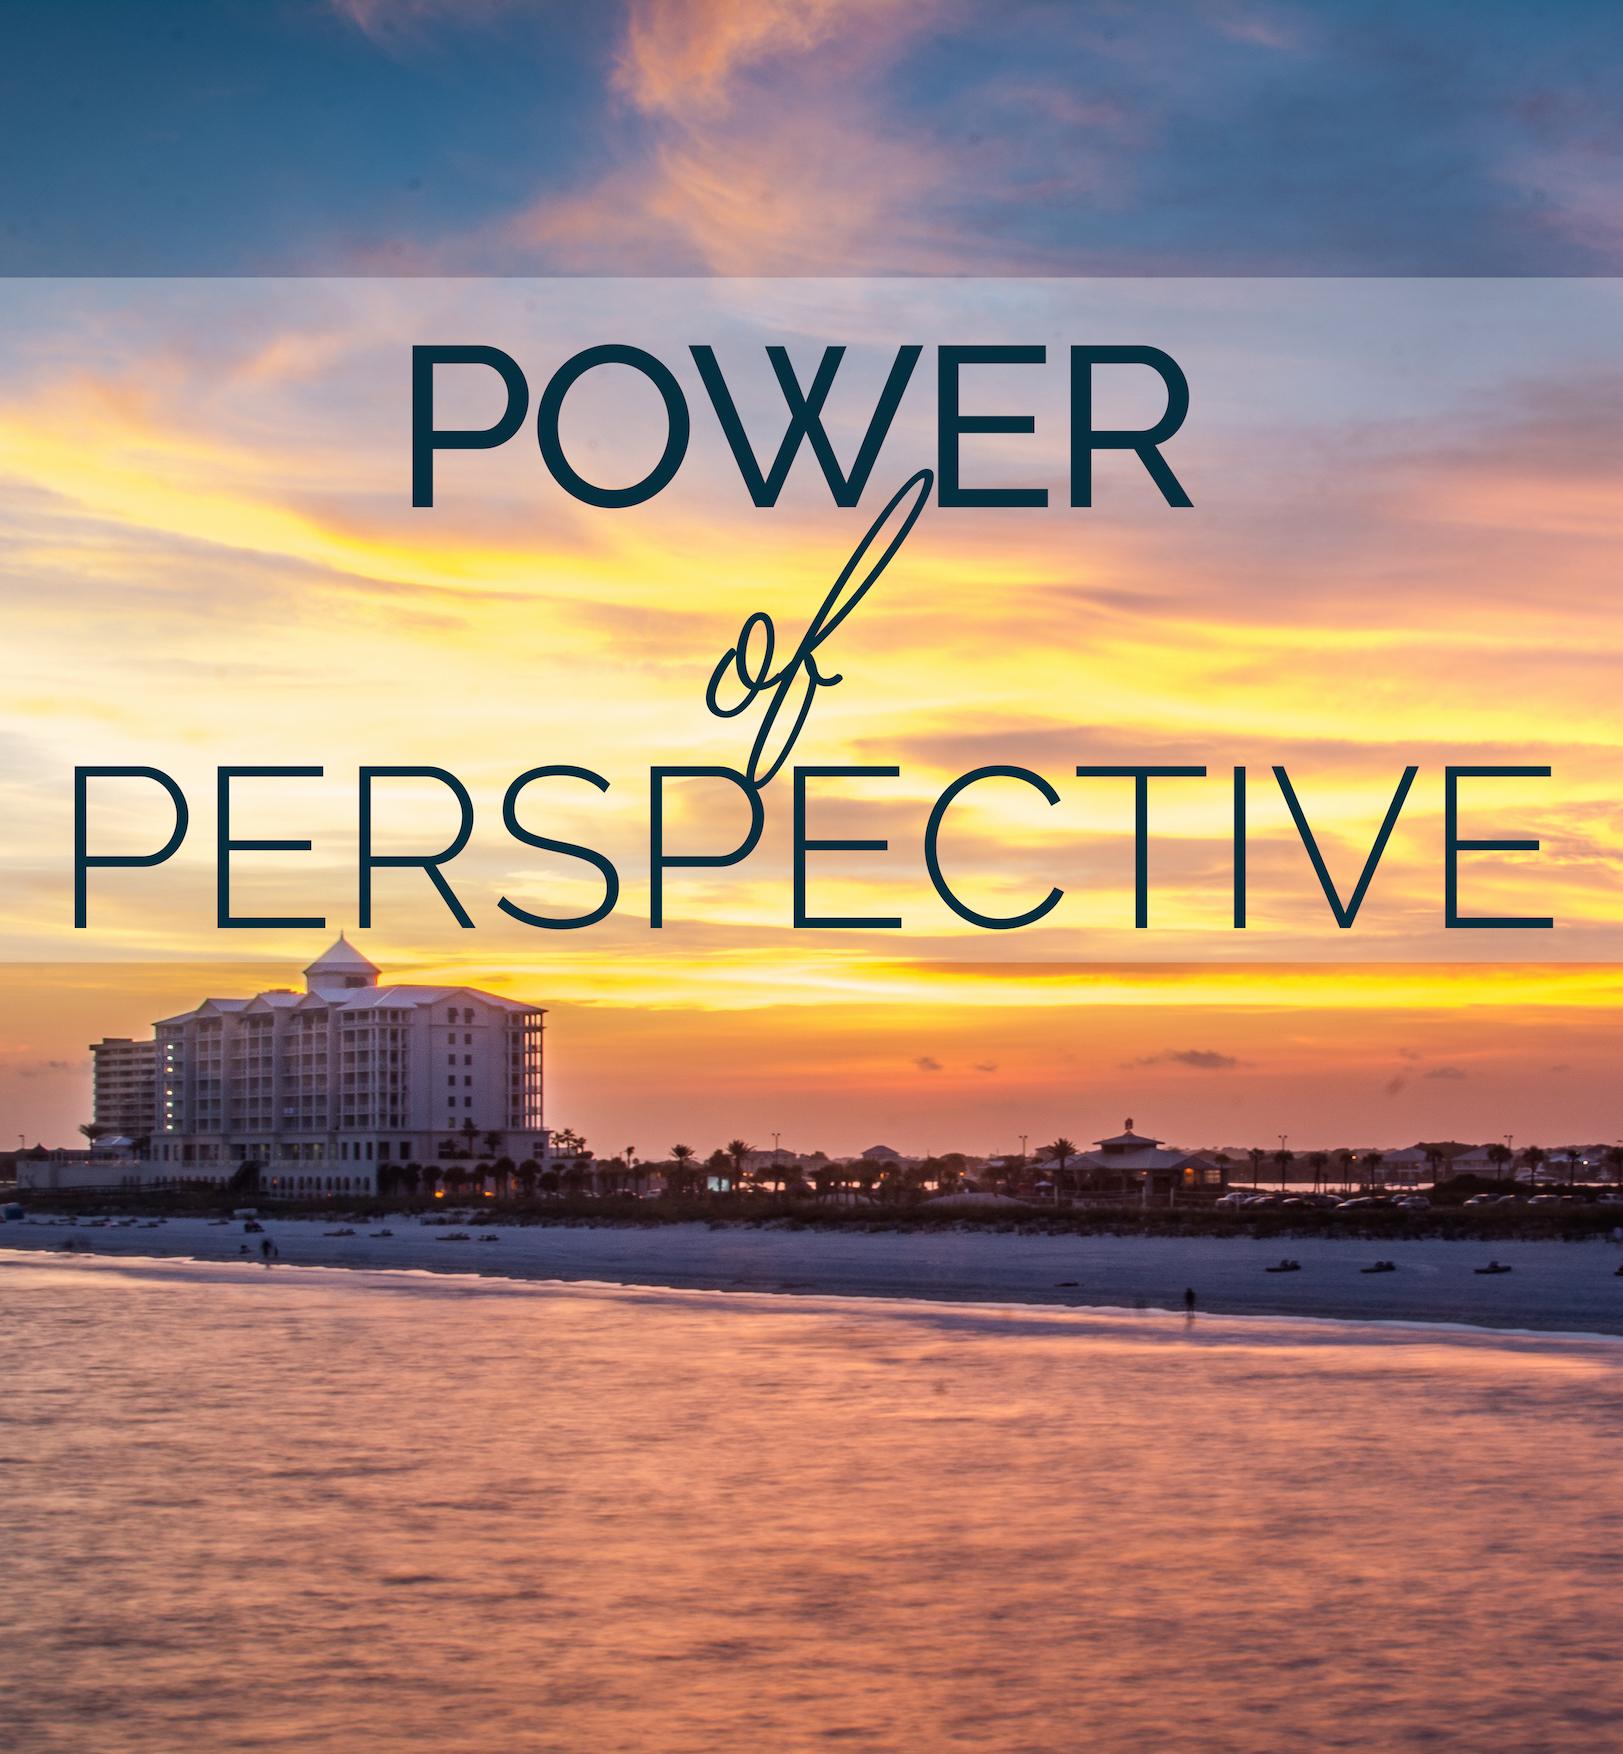 Power of Perspective - Leslie Brown